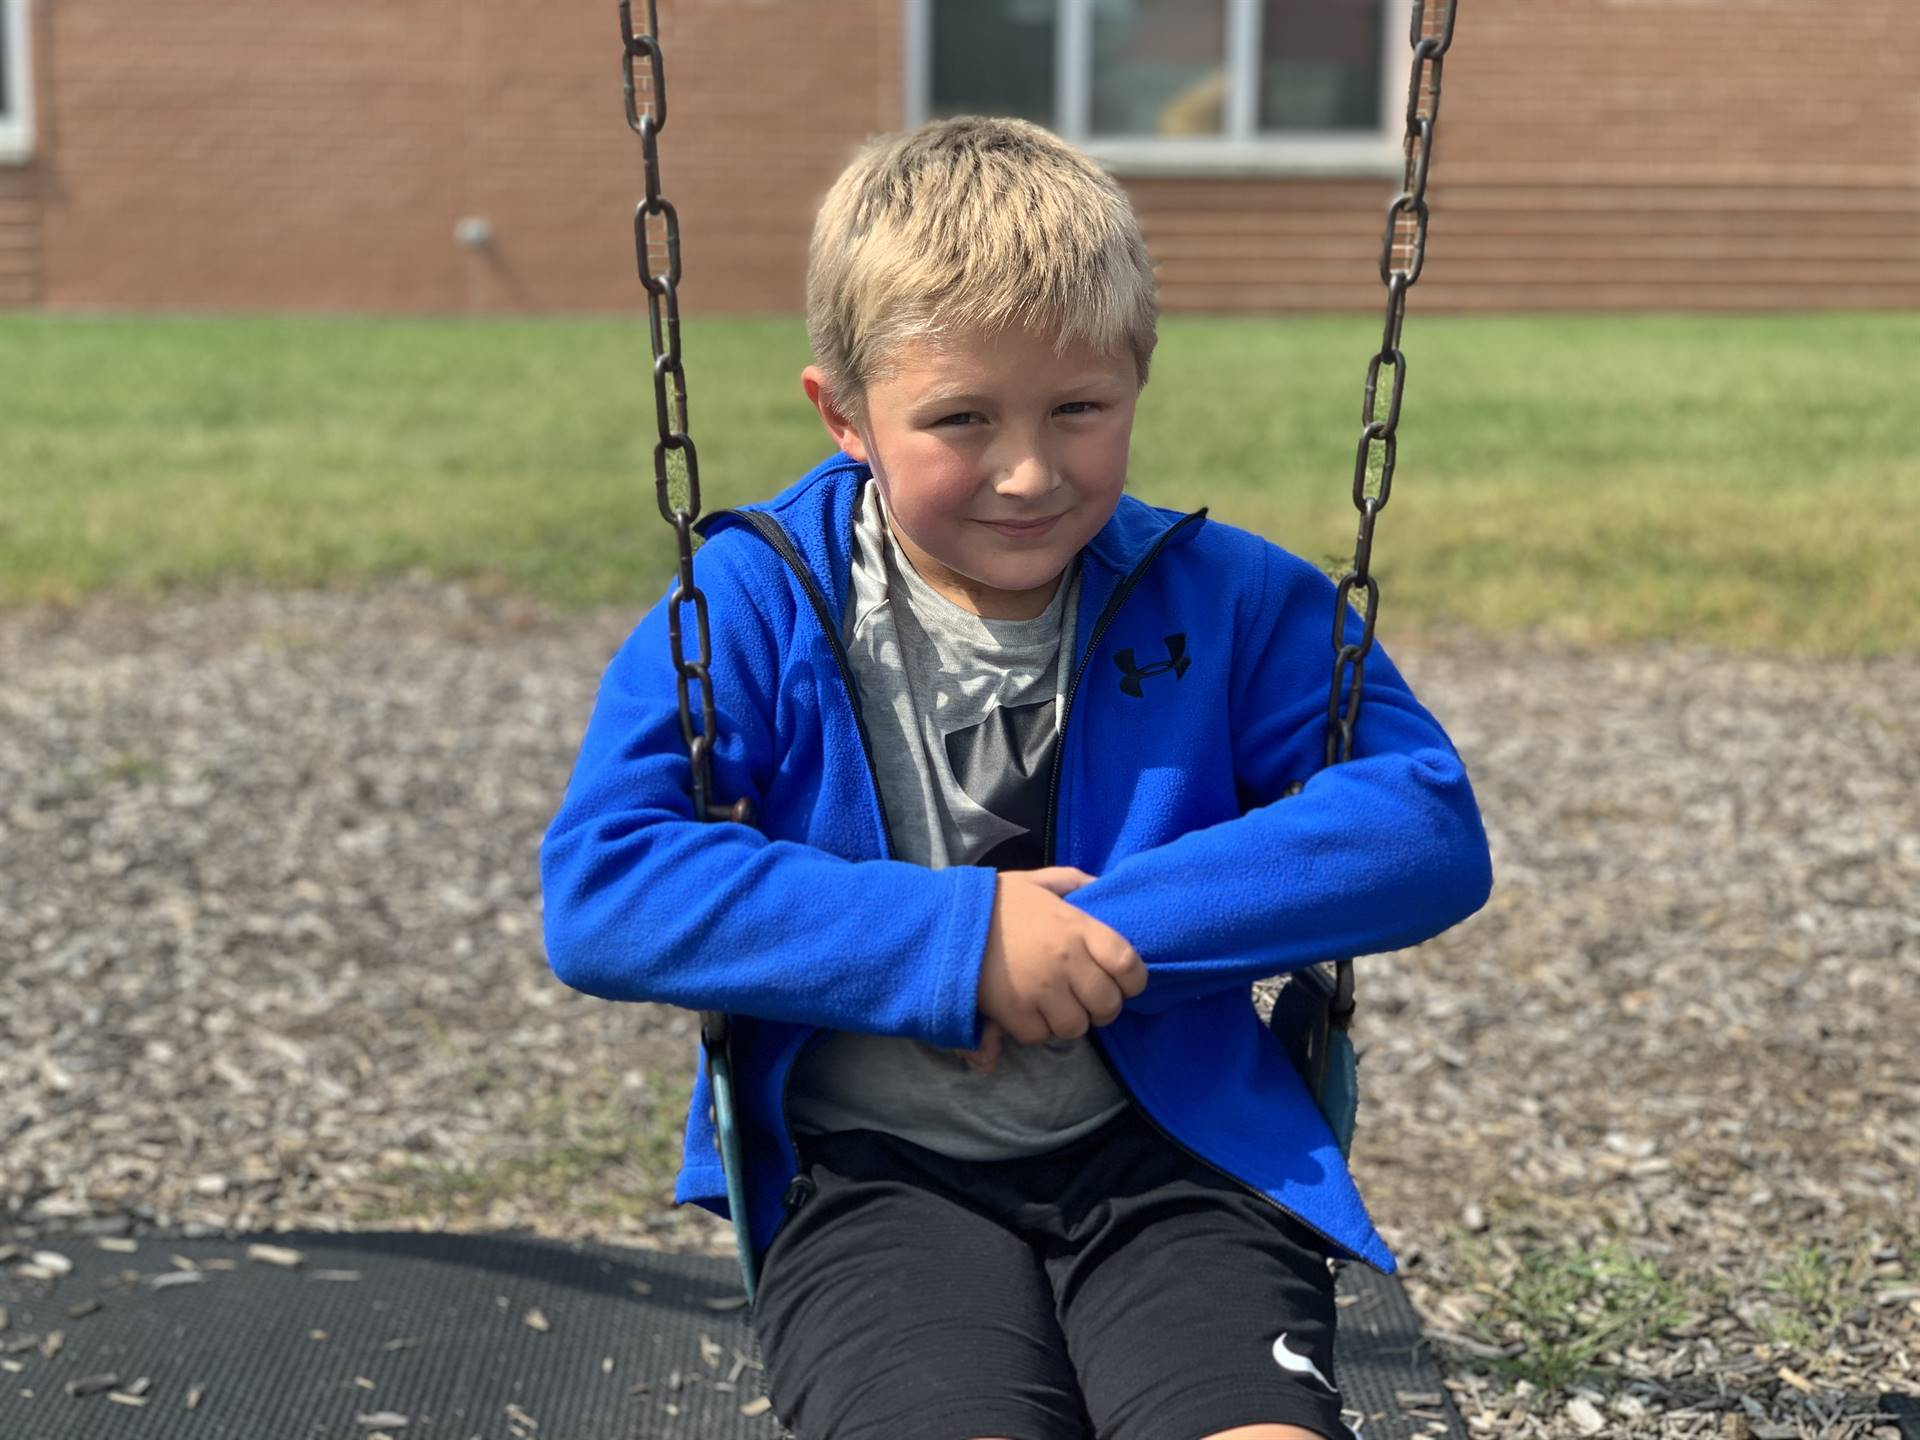 1st grader swinging